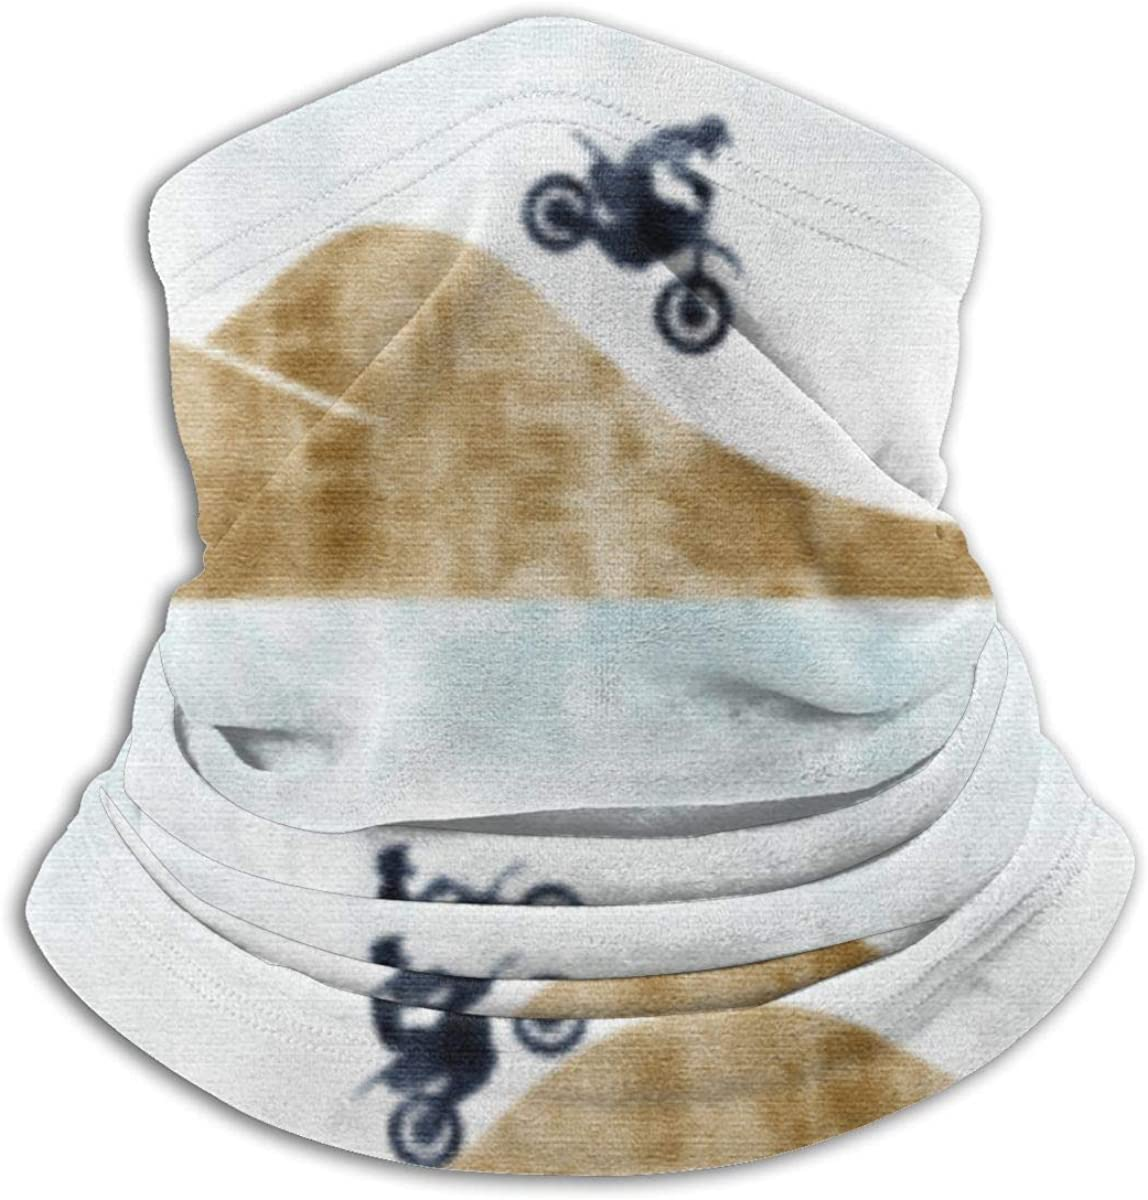 Motocross Dirt Bike Neck Warmer Gaiter For Men Women Headband Face Mask Bandana Head Wrap Scarf Headwear Winter Balaclava For Ski Running Motorcycle